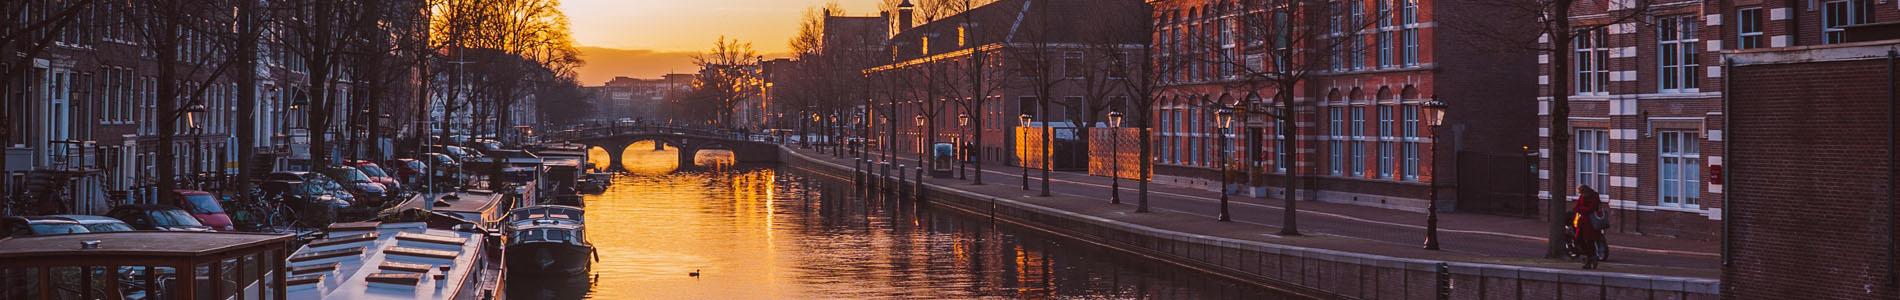 amsterdam skinny